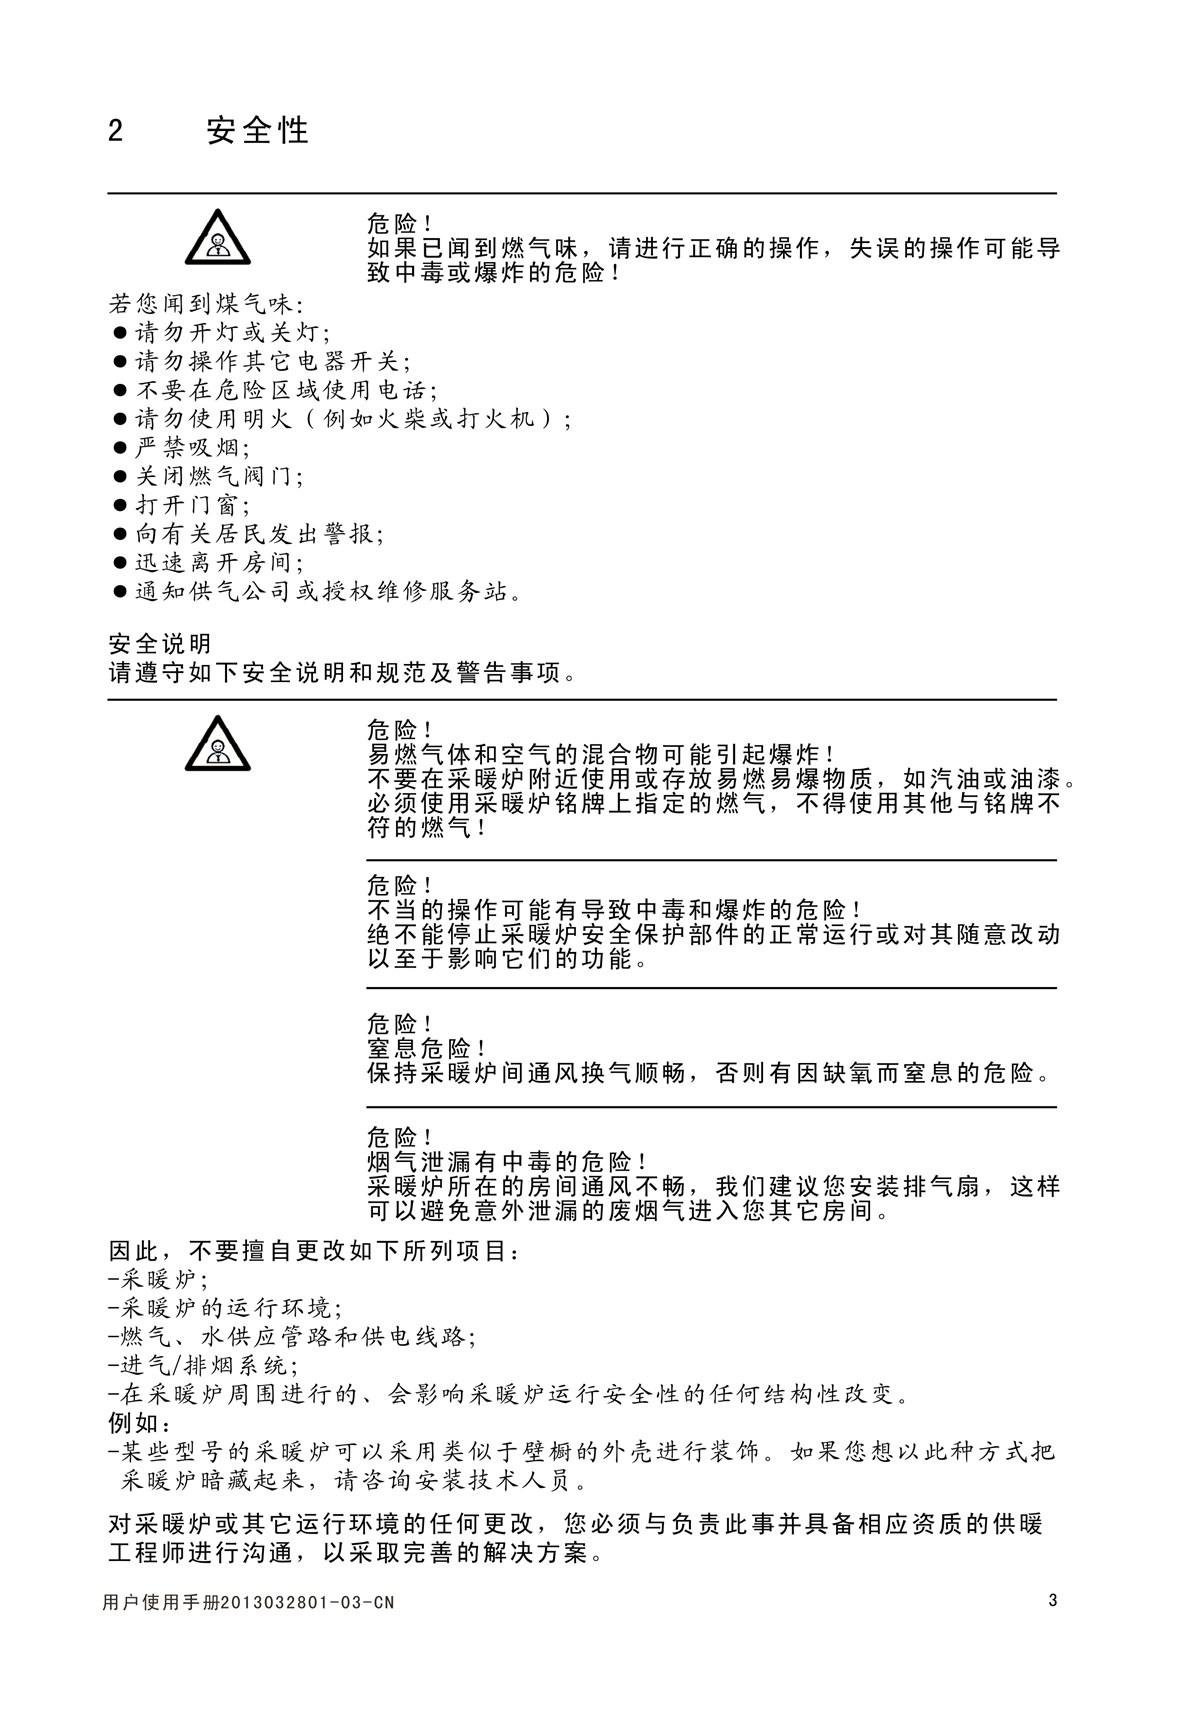 ES03系列-用户使用手册-4_02.jpg